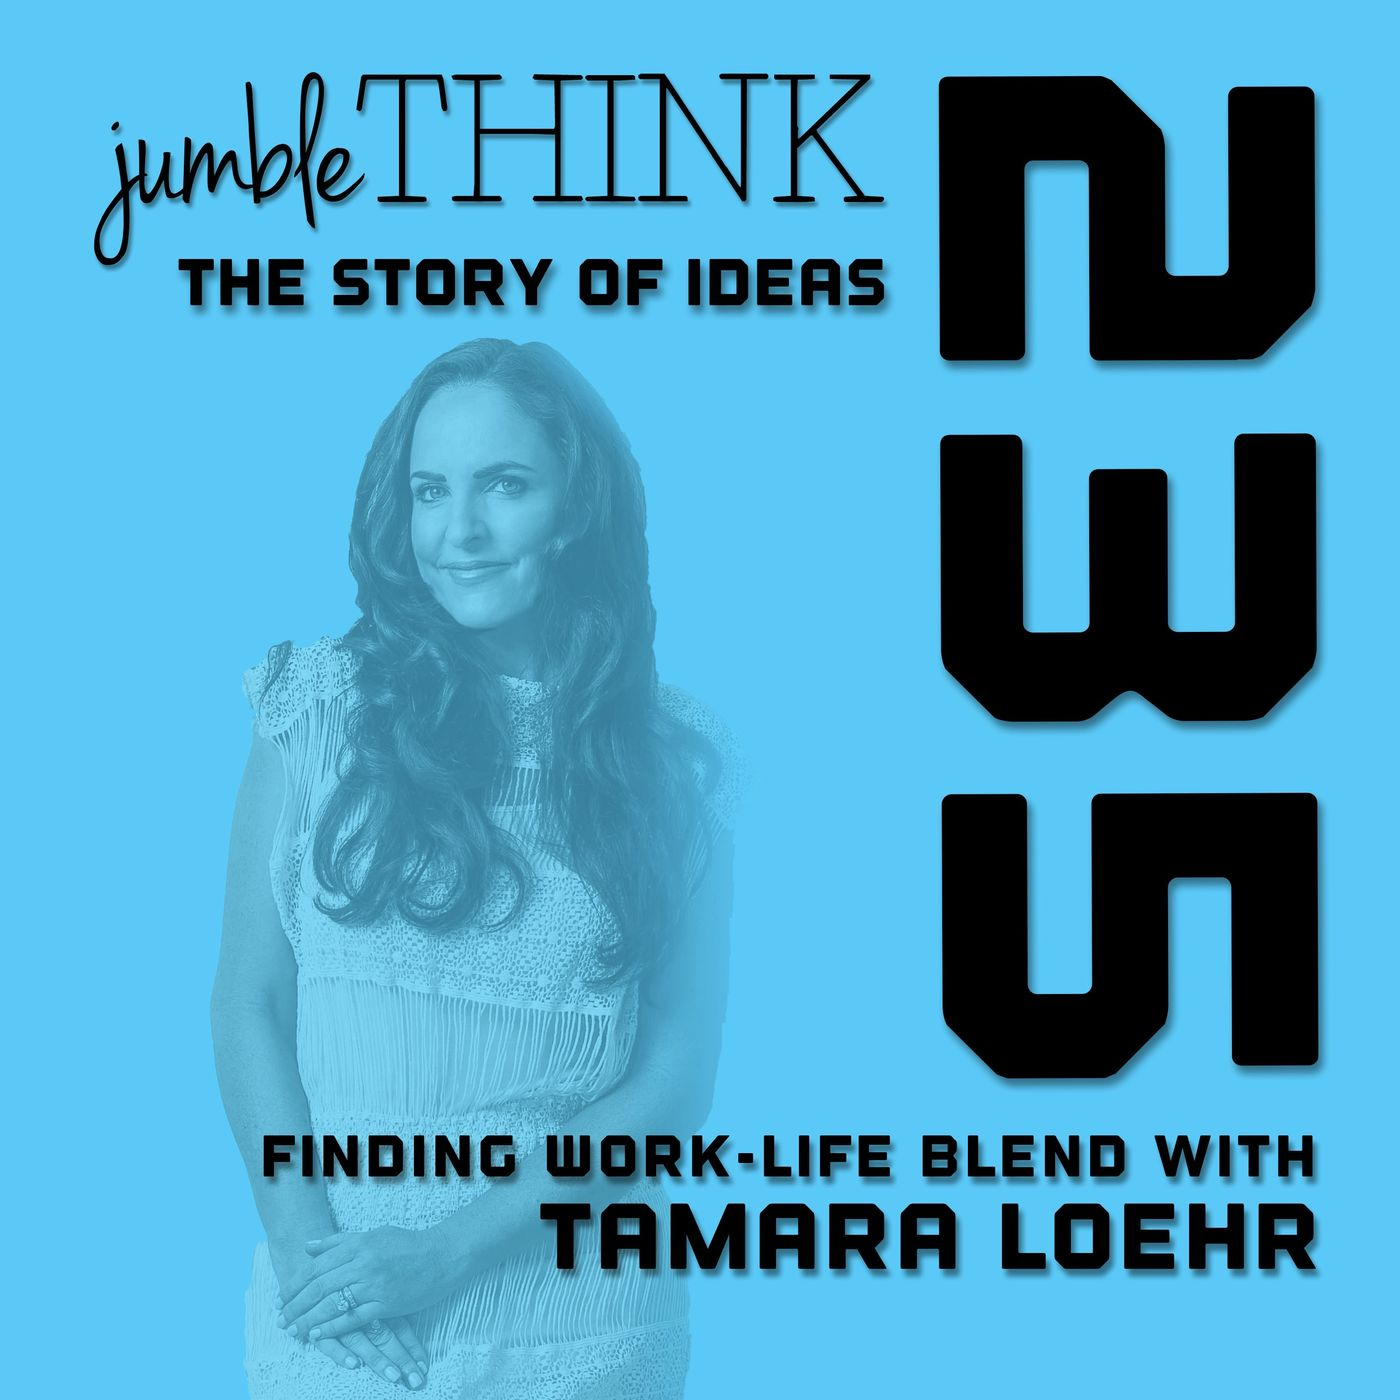 Finding Work-Life Blend with Tamara Loehr